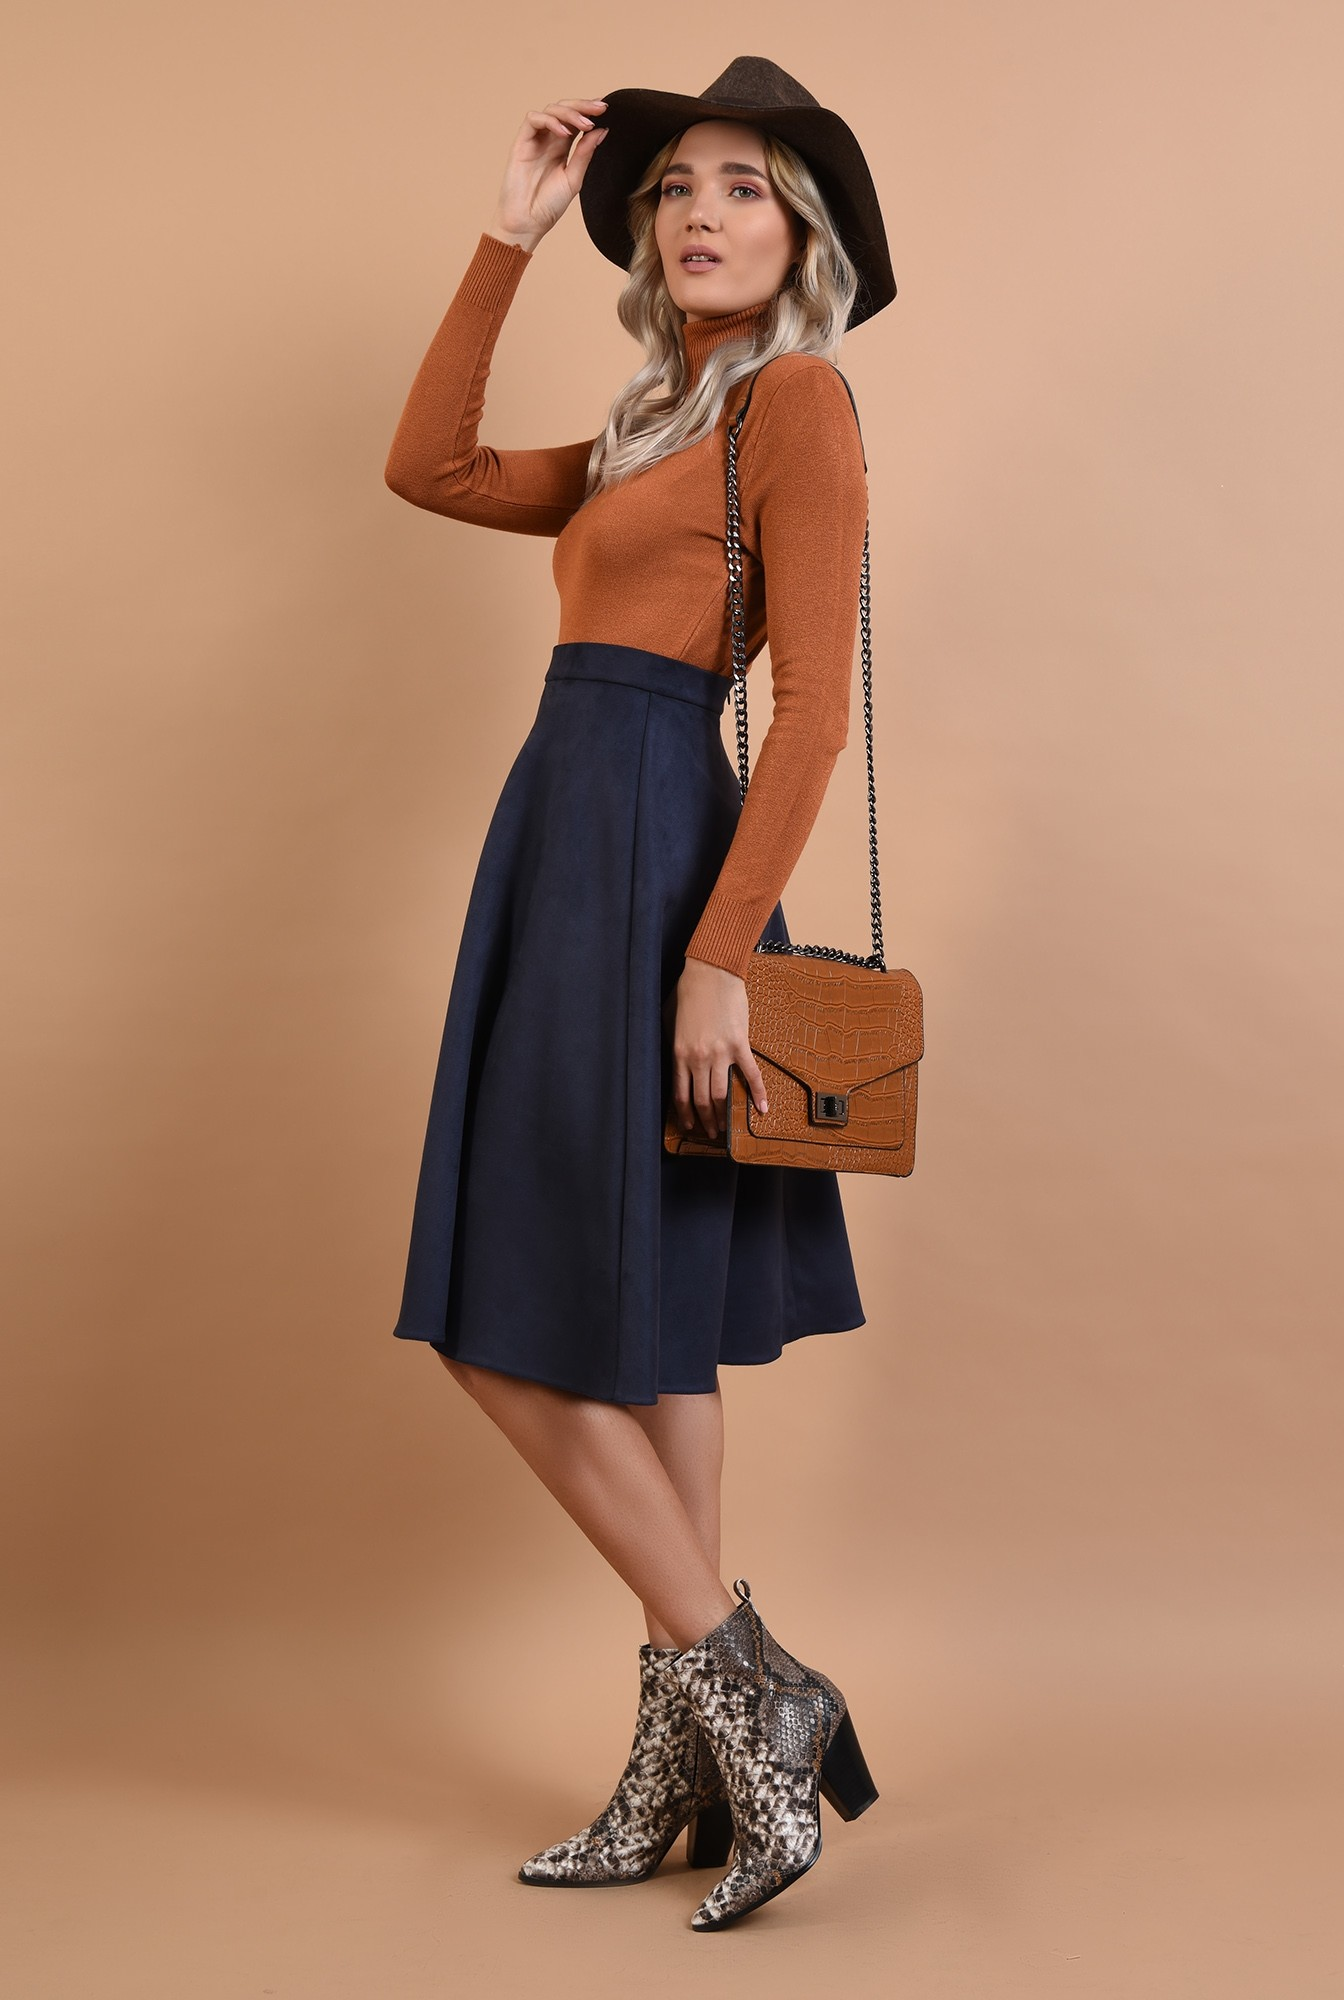 3 - maleta maro, stretch, Poema, bronz, camel, guler inalt